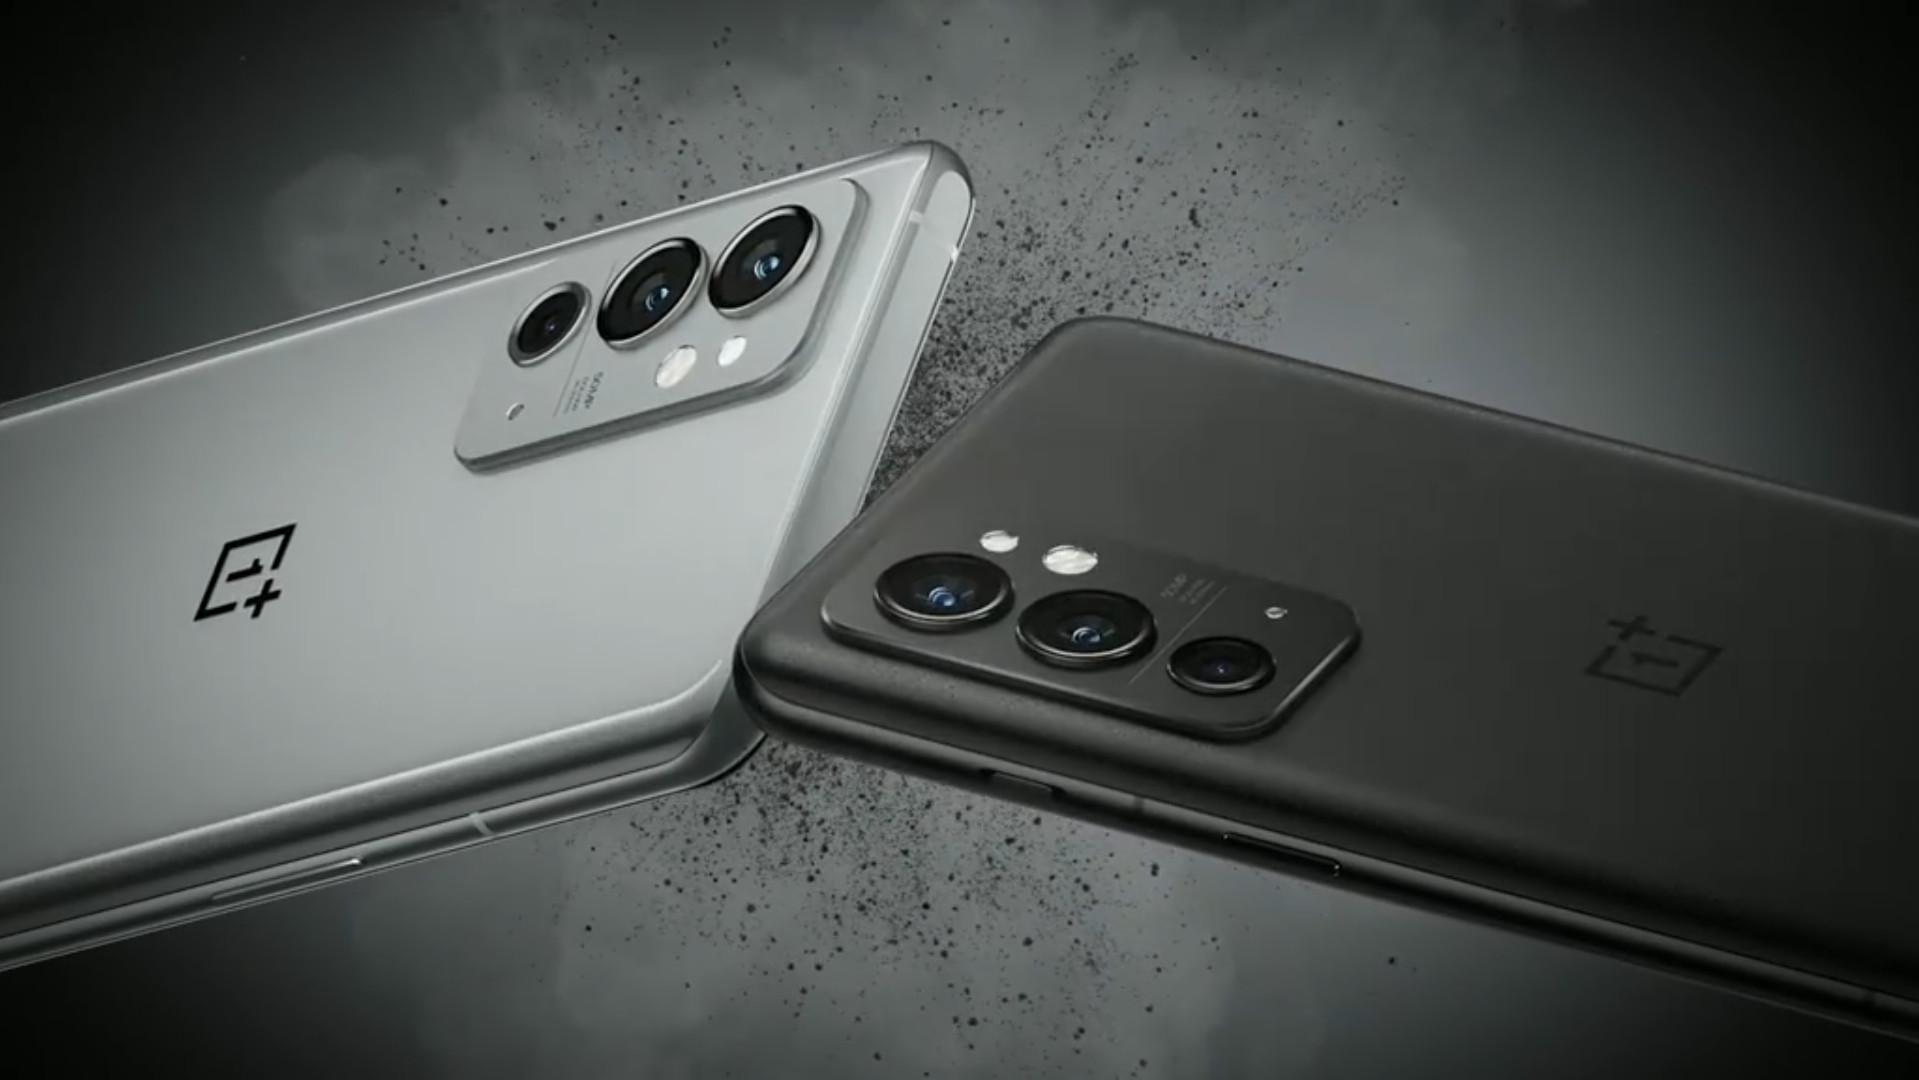 47829 Представлен OnePlus 9RT за 510 долларов. Дешёвый флагман или всё-таки нет?